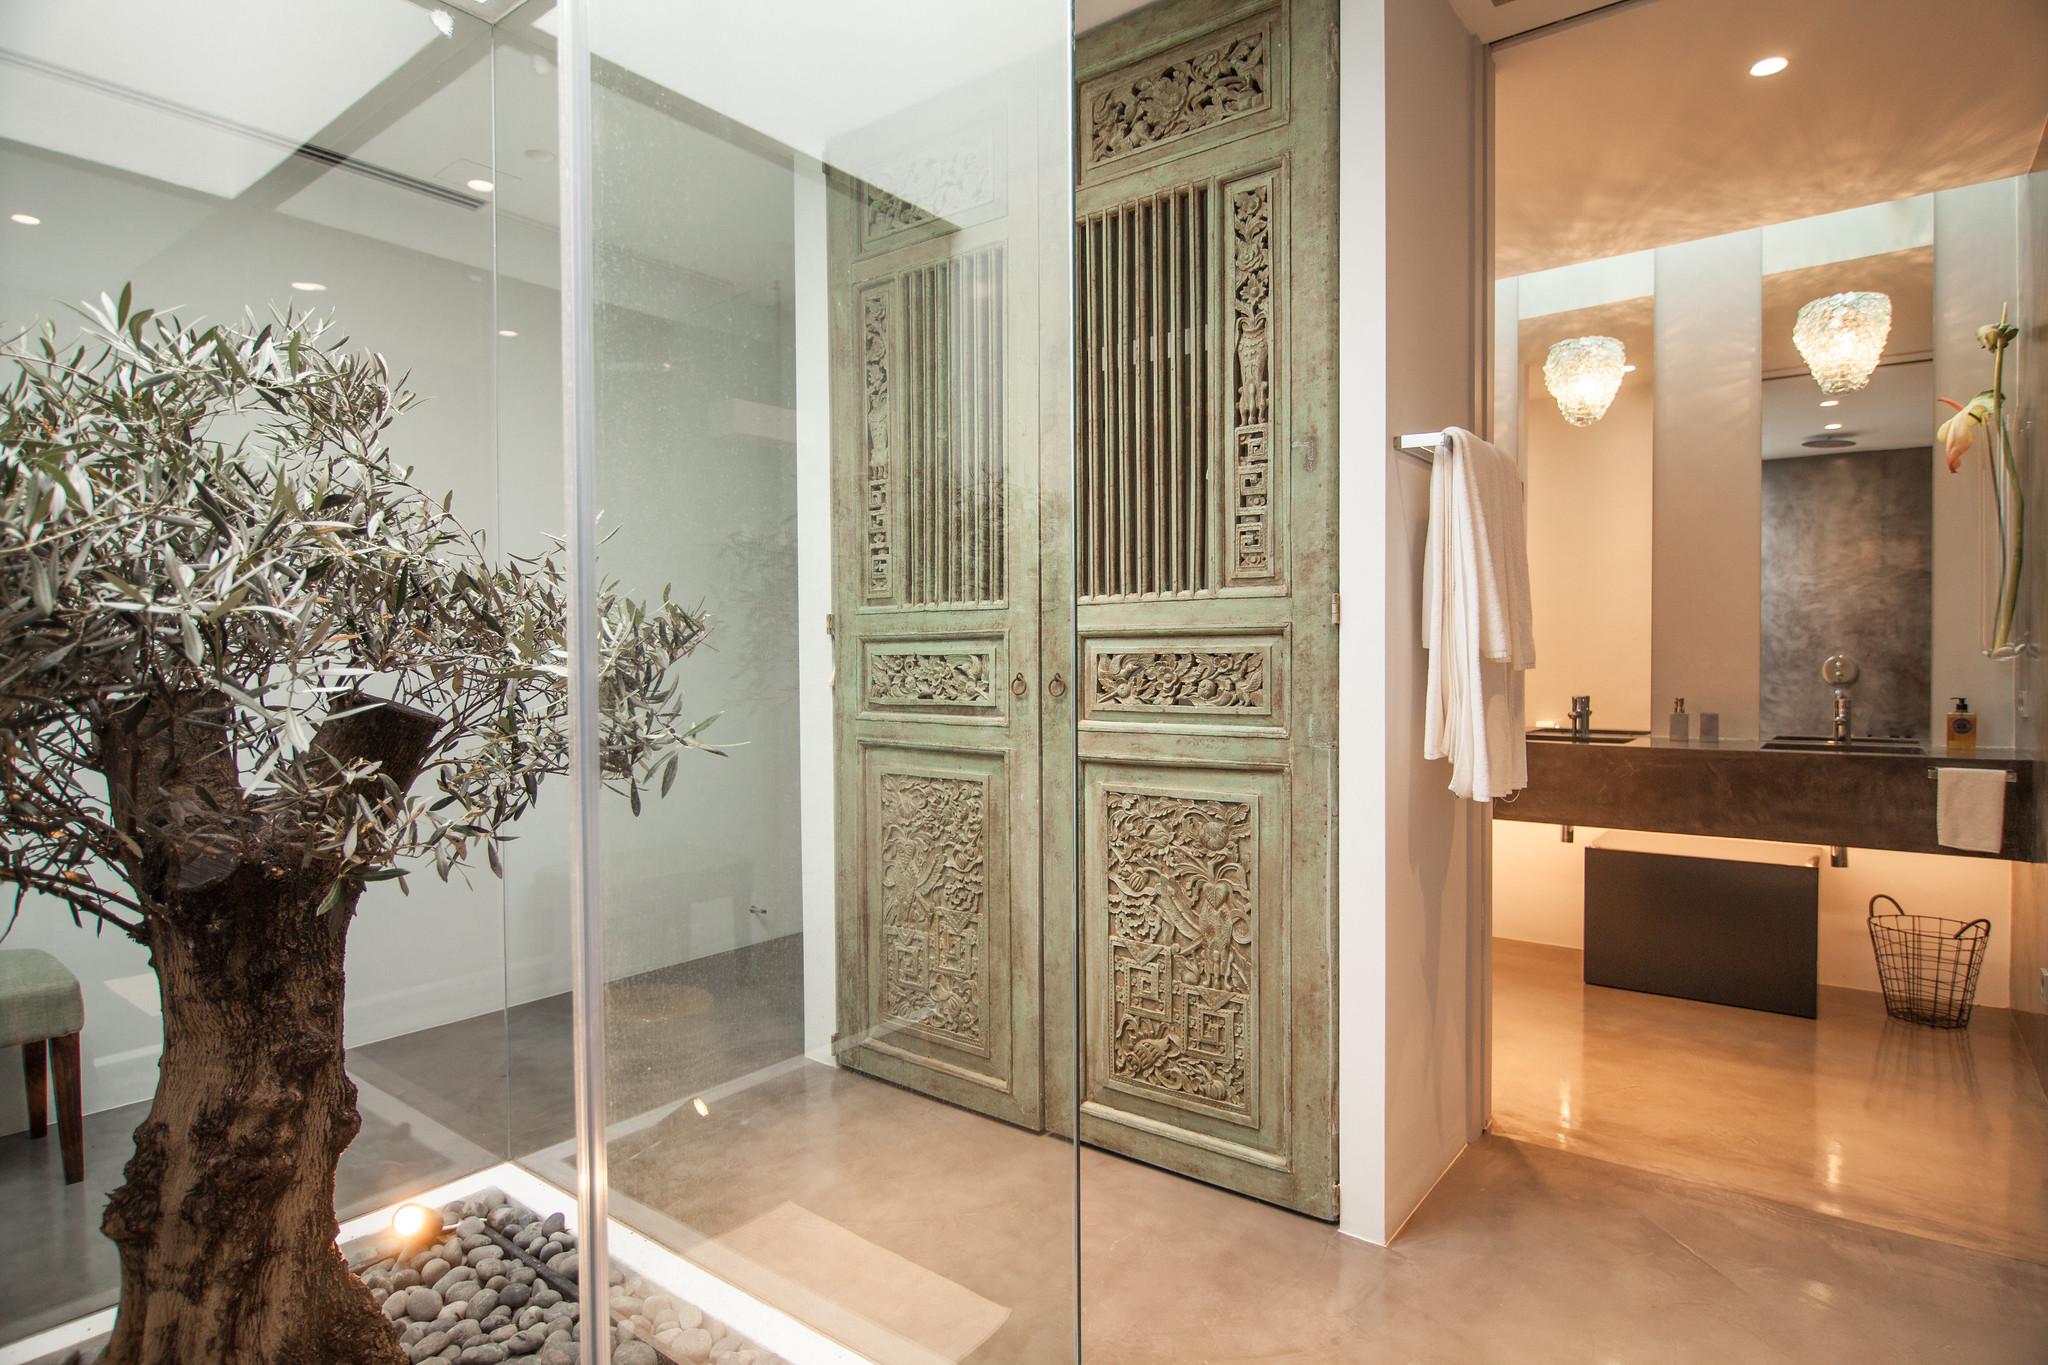 https://www.white-ibiza.com/wp-content/uploads/2020/05/white-ibiza-villas-can-zama-bathroom-one.jpg